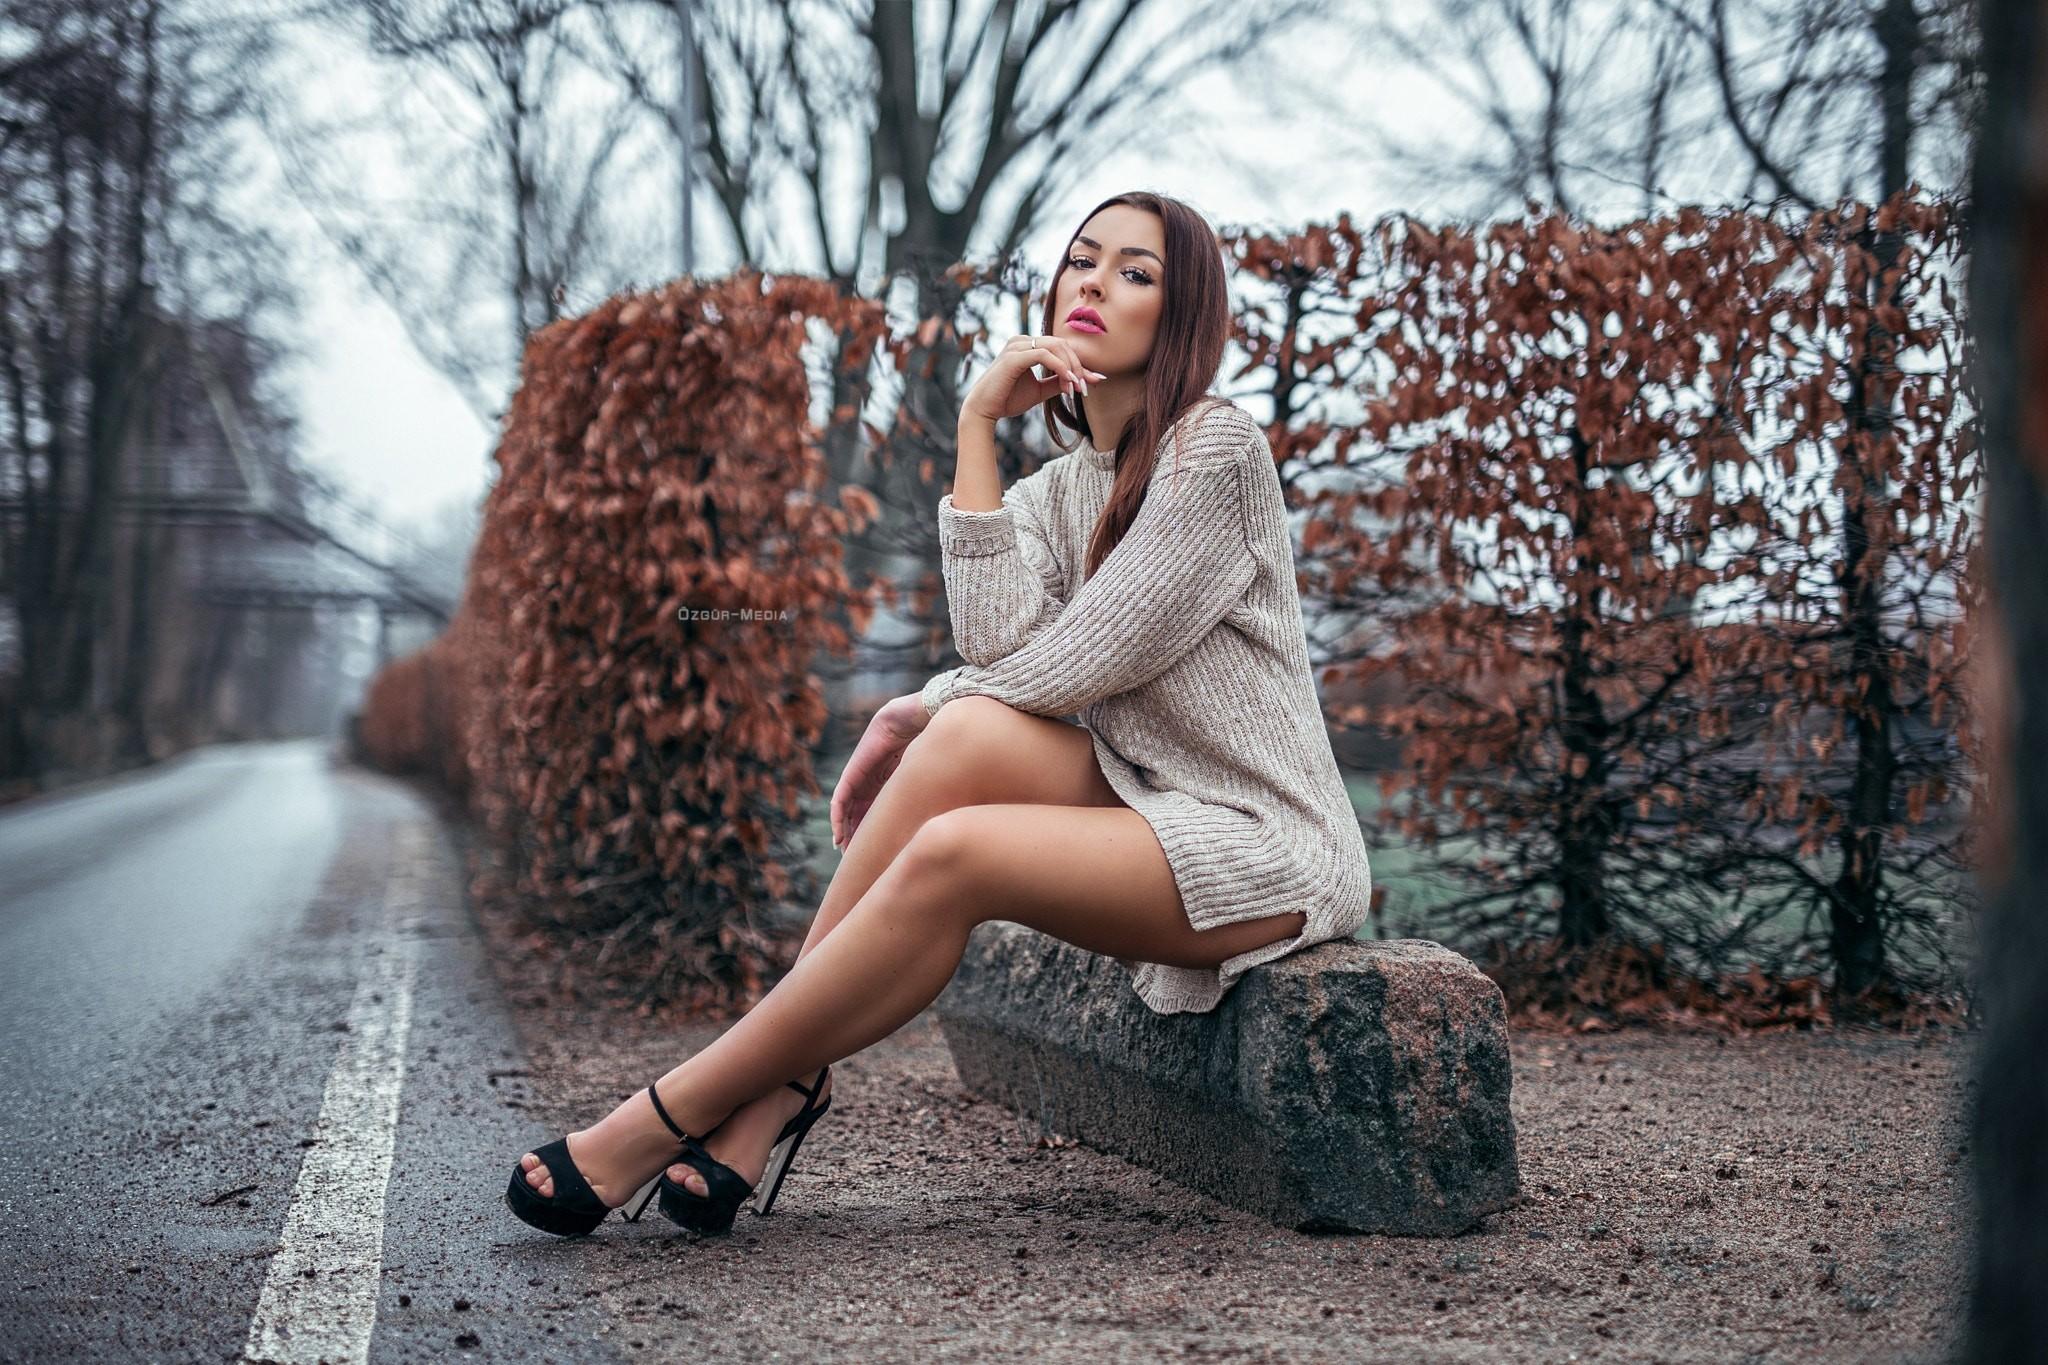 women Outdoors, Women, Model, Field, Nature Wallpapers HD